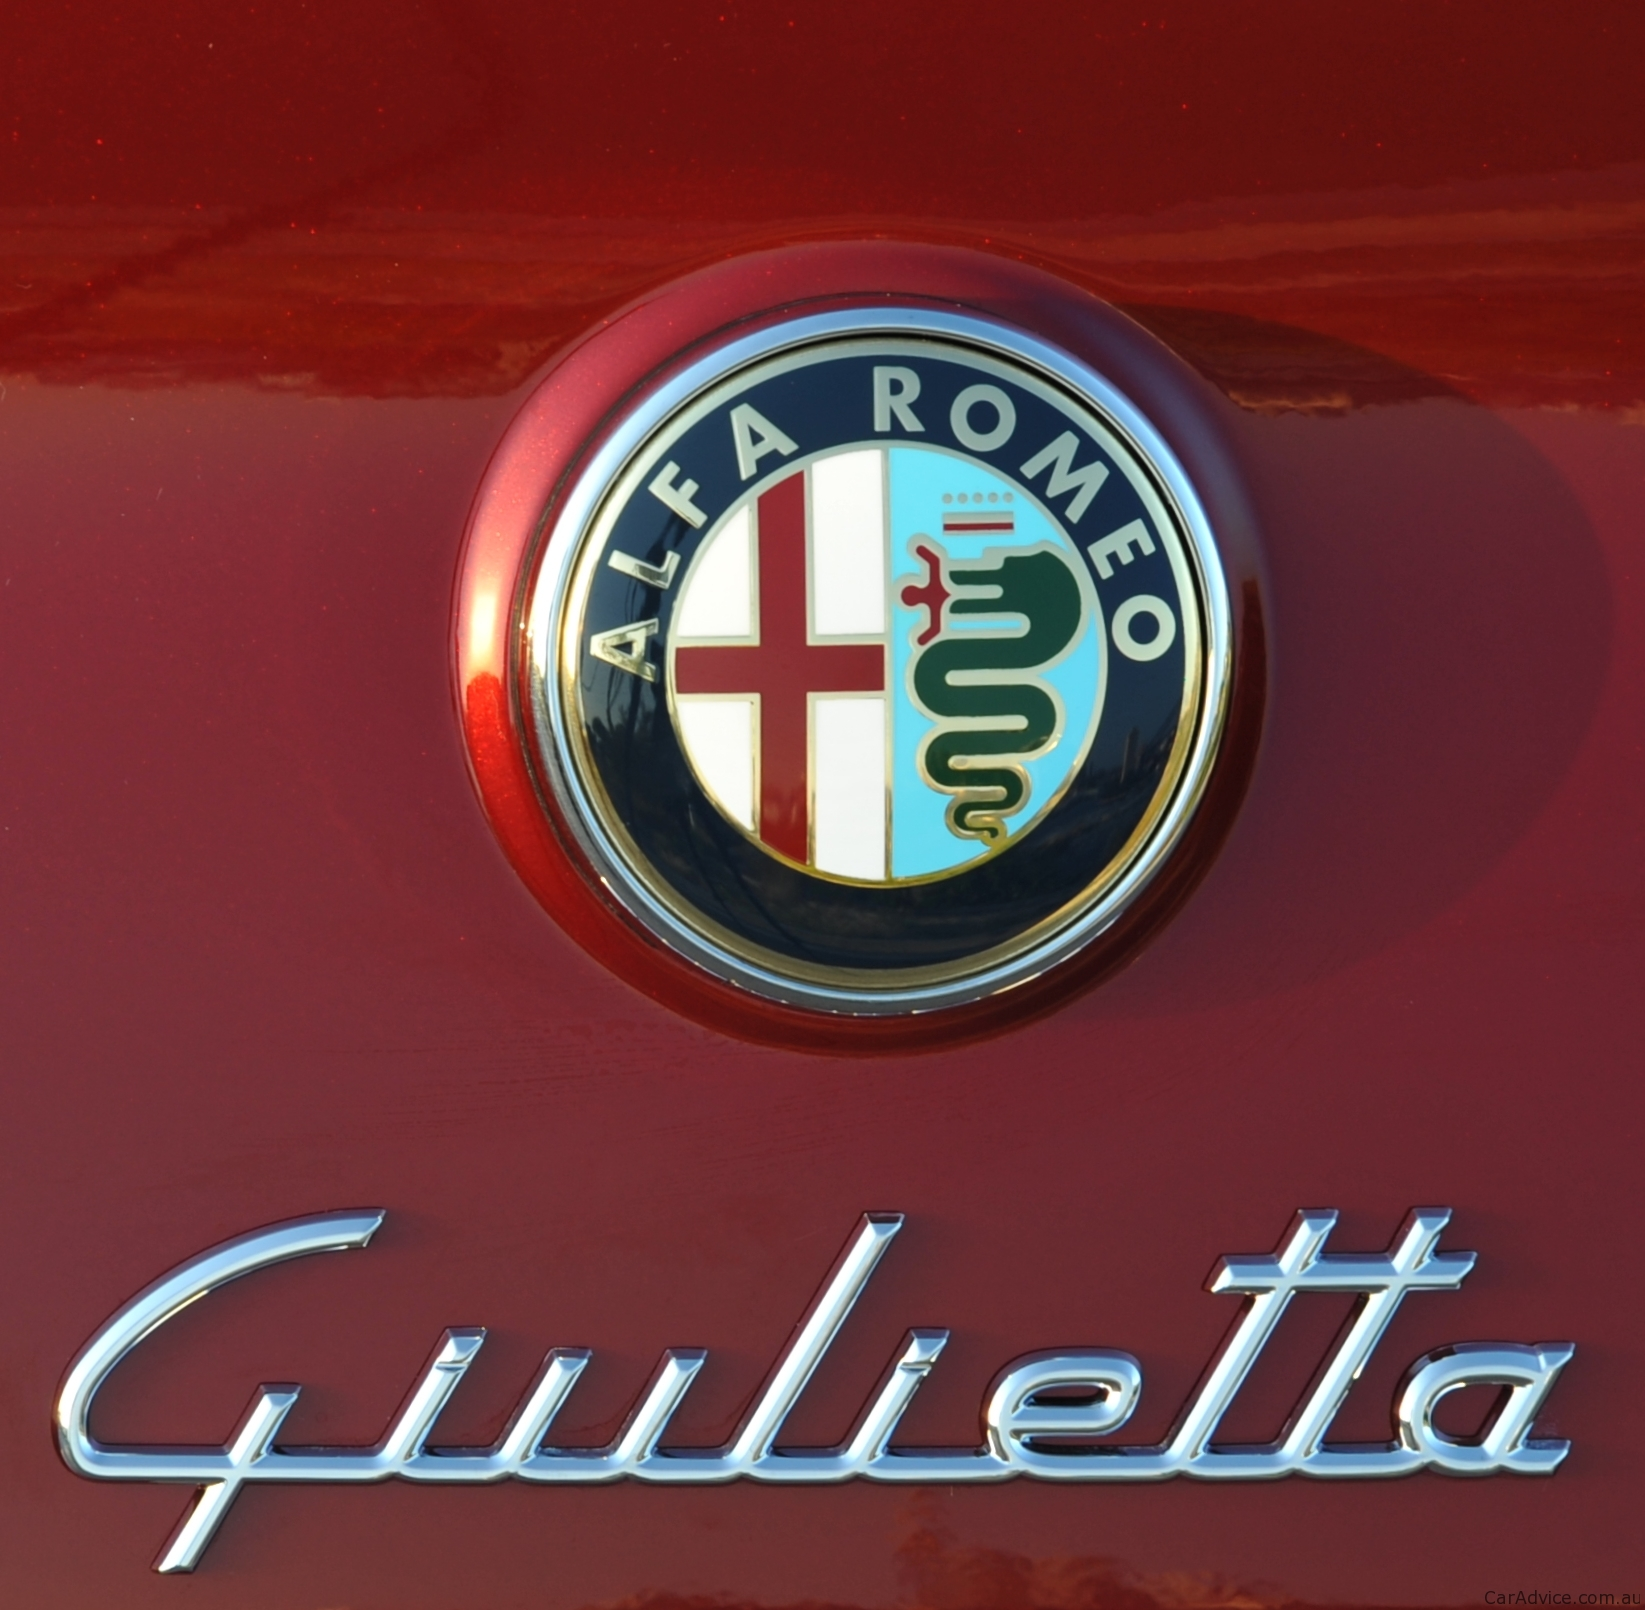 2011 alfa romeo giulietta on sale in australia photos 1 of 25. Black Bedroom Furniture Sets. Home Design Ideas